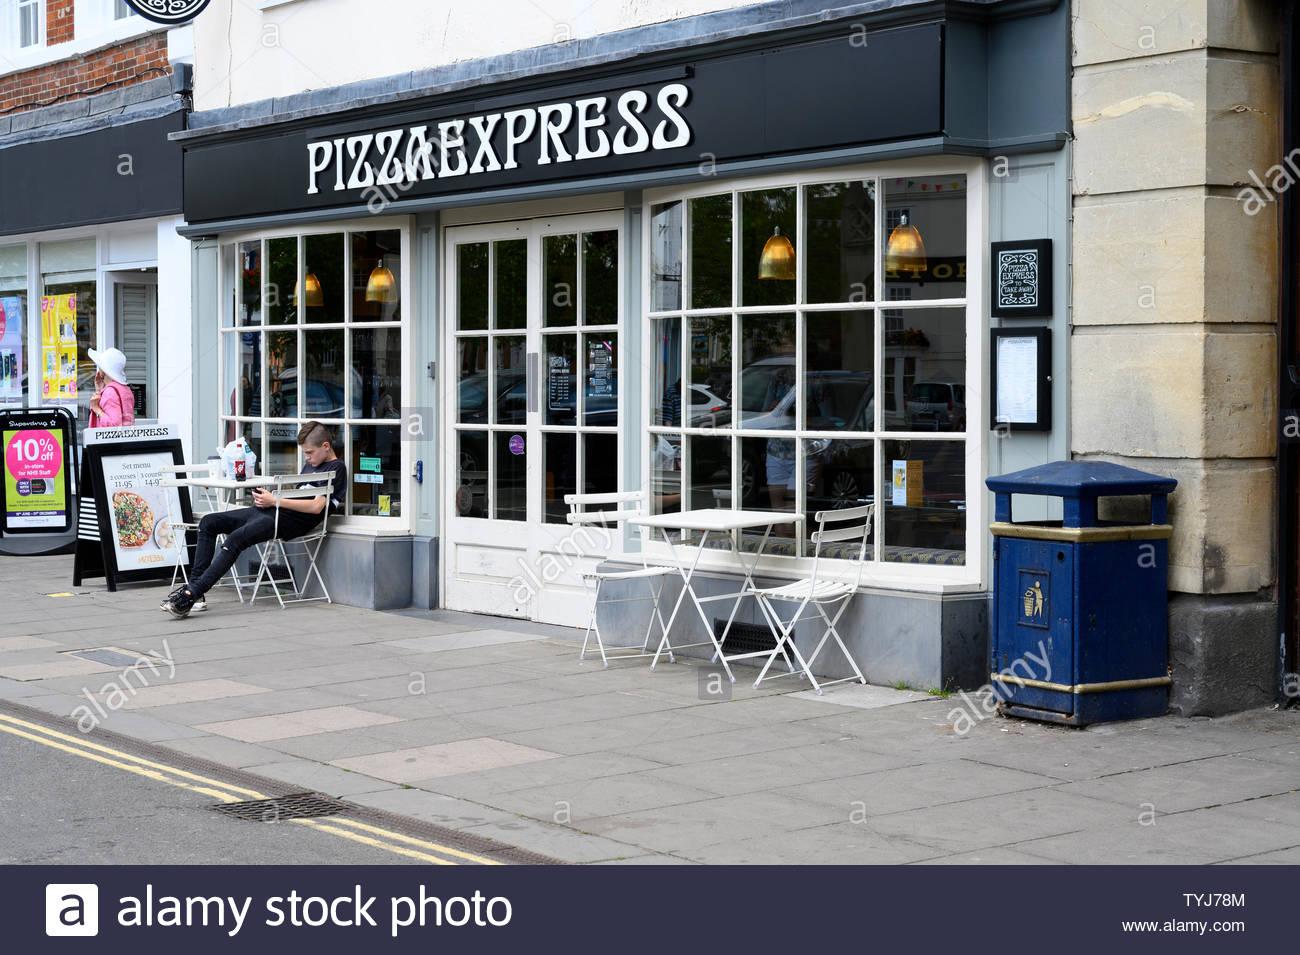 Pizza Express Restaurant Chain Stock Photos Pizza Express